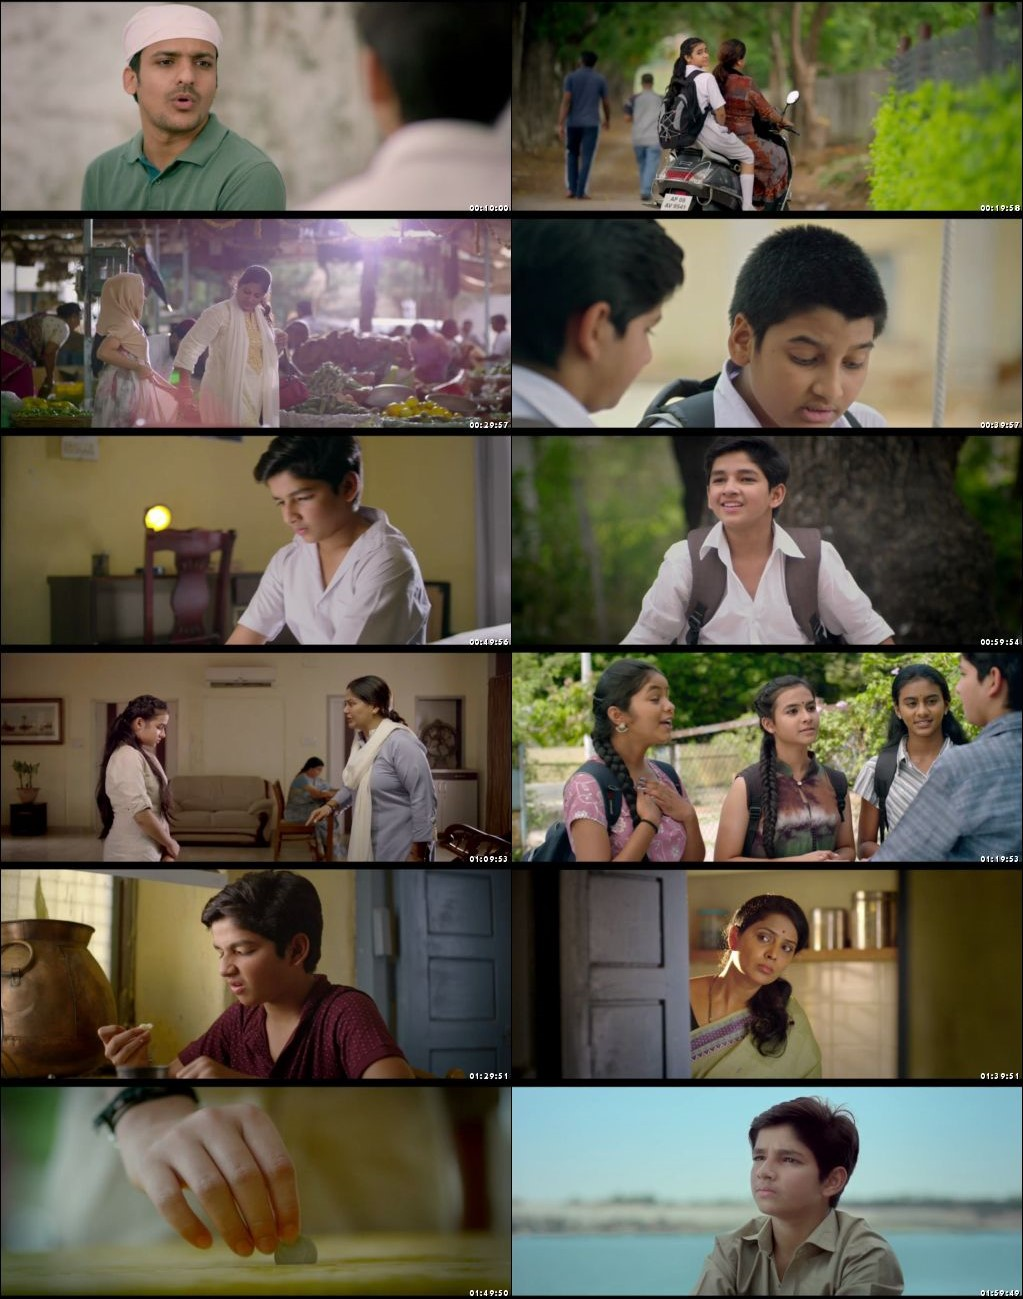 Boy 2019 Full Hindi Movie Online Watch